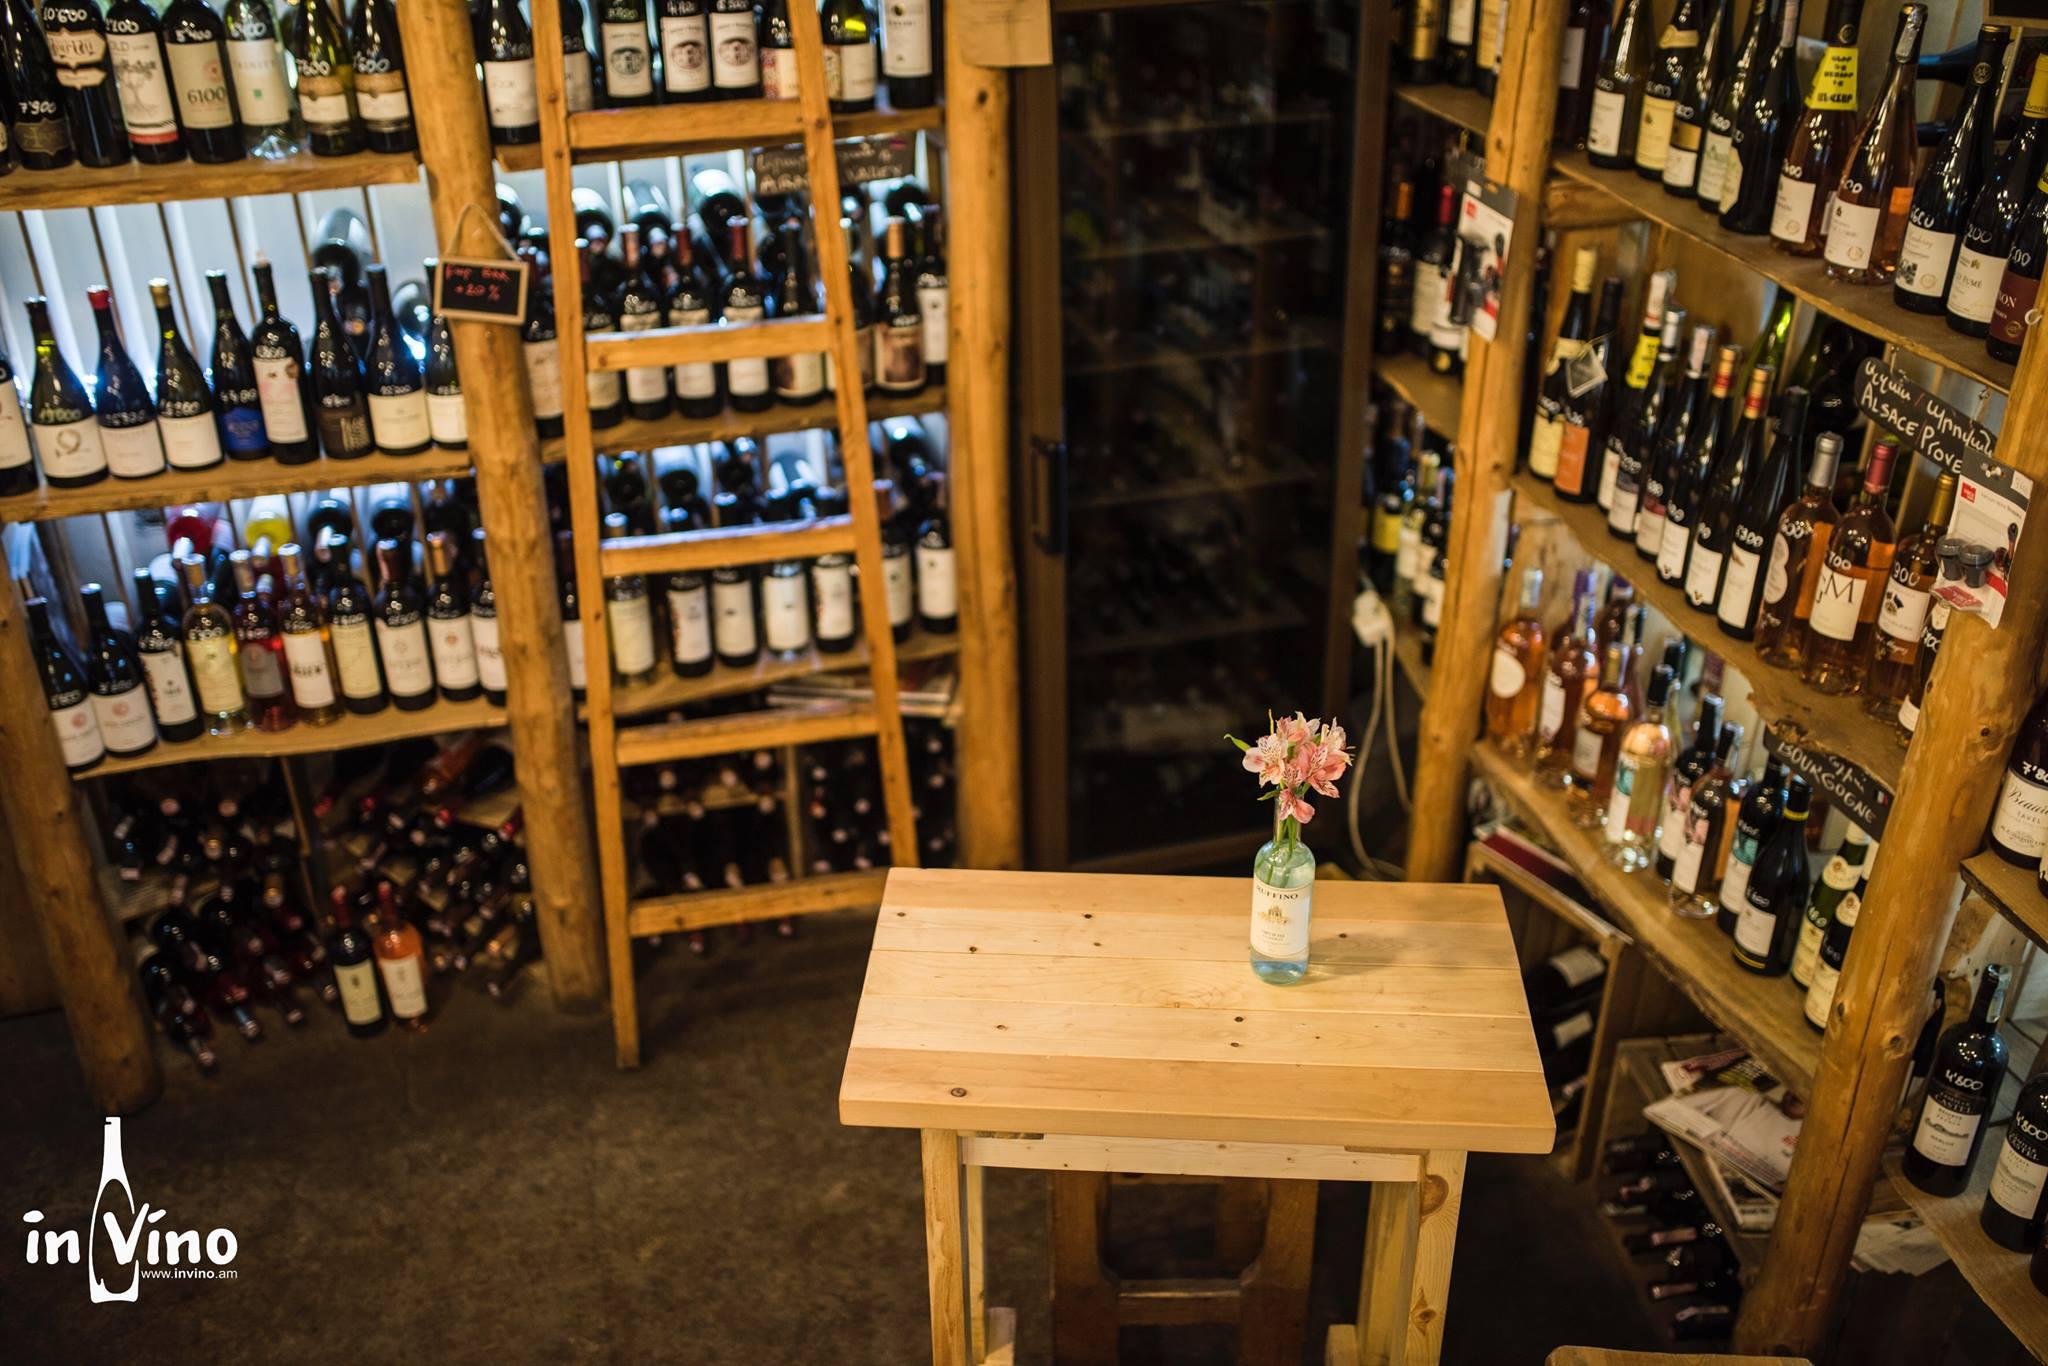 Винный бар и магазин Ин Вино